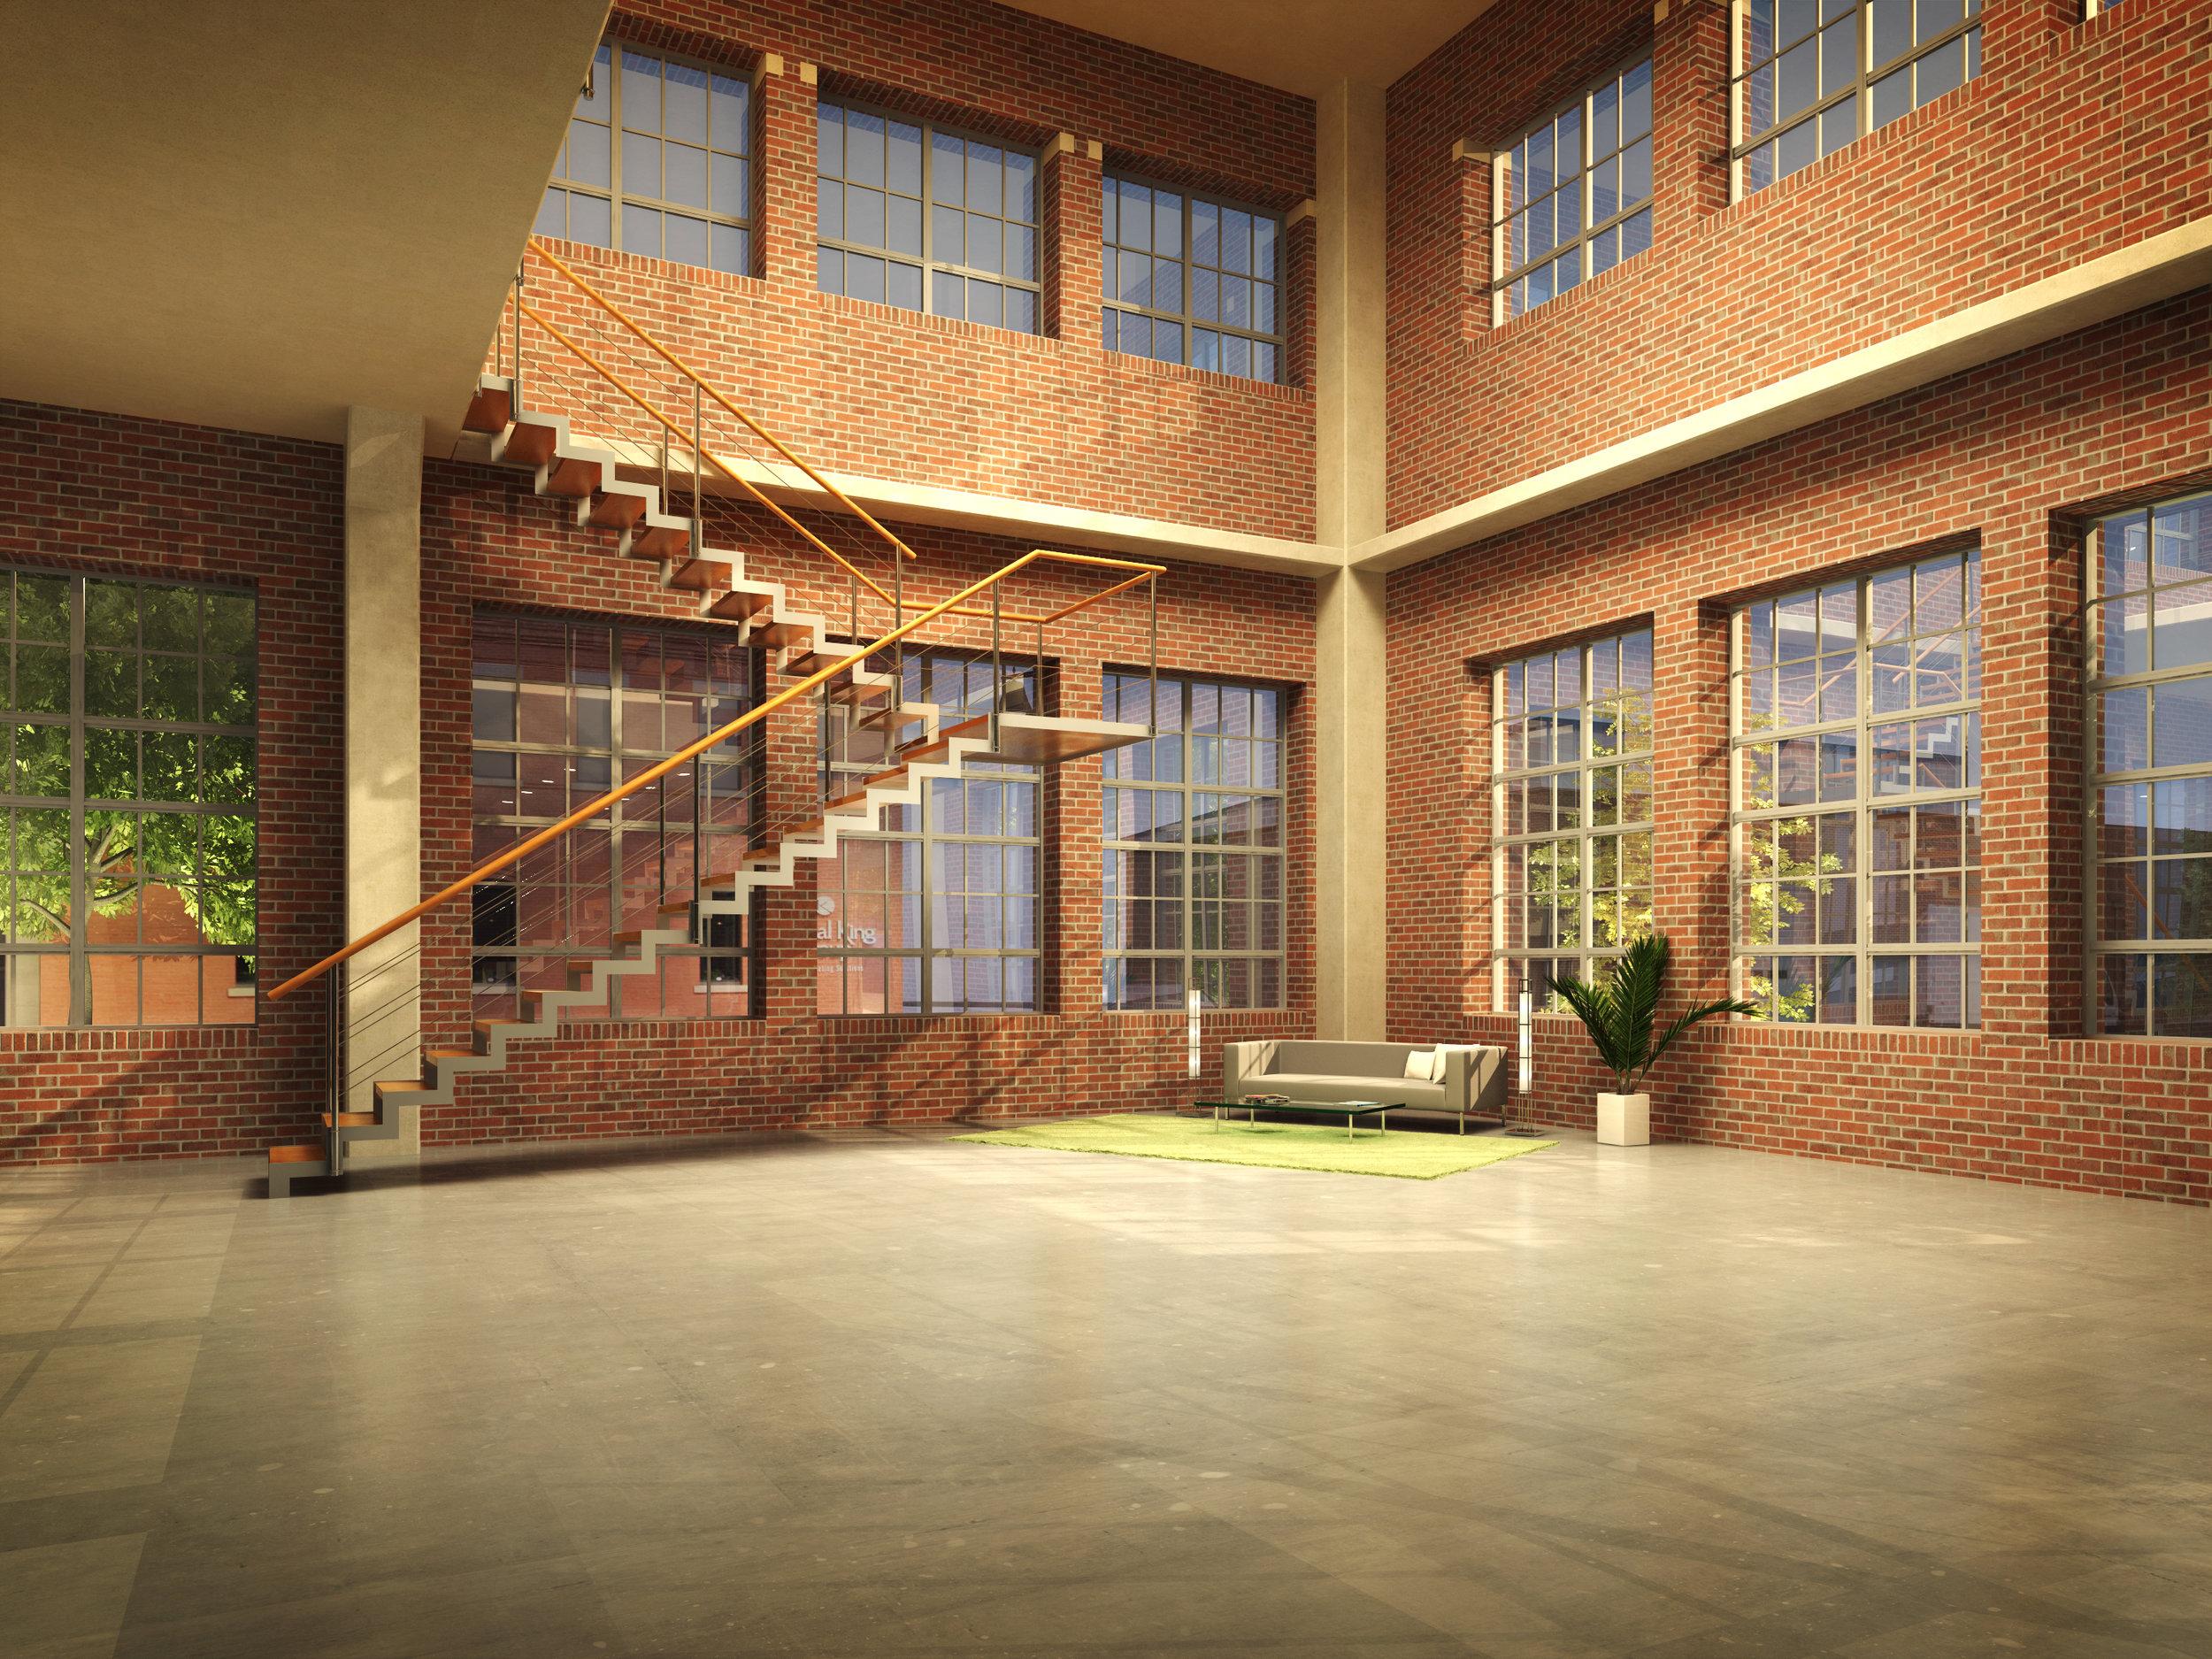 CC_Interior_01 Brick.jpg